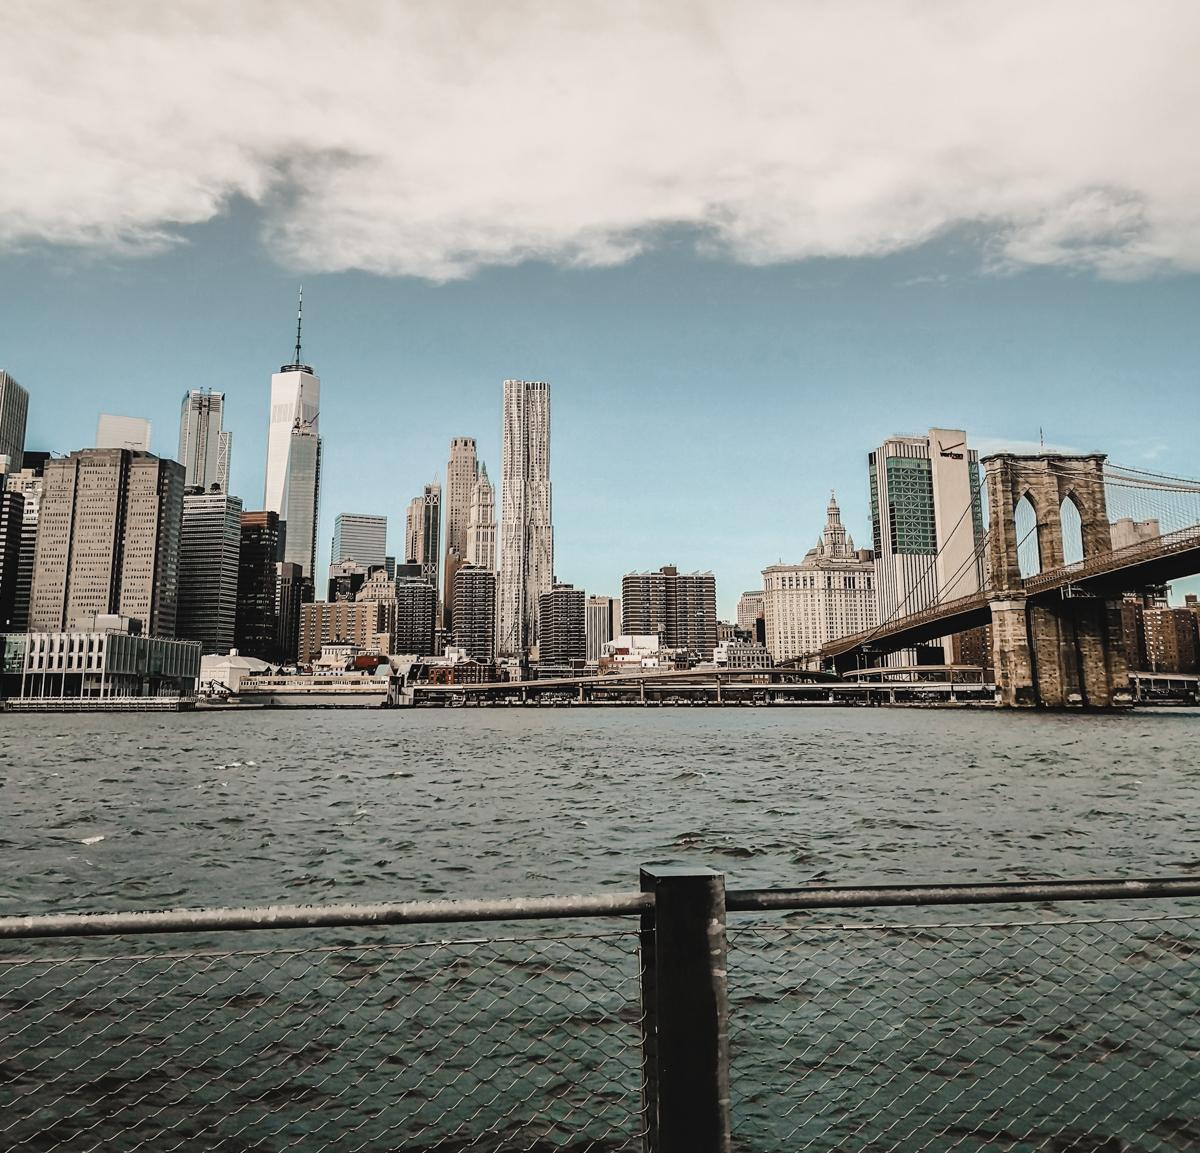 Tommeezjerry-Lifestyleblog-Fashionblog-Maennermodeblog-Maennerblog-Modeblog-Huawei-Mate-10-Pro-Travel-Photography-New-York-City-Architecture